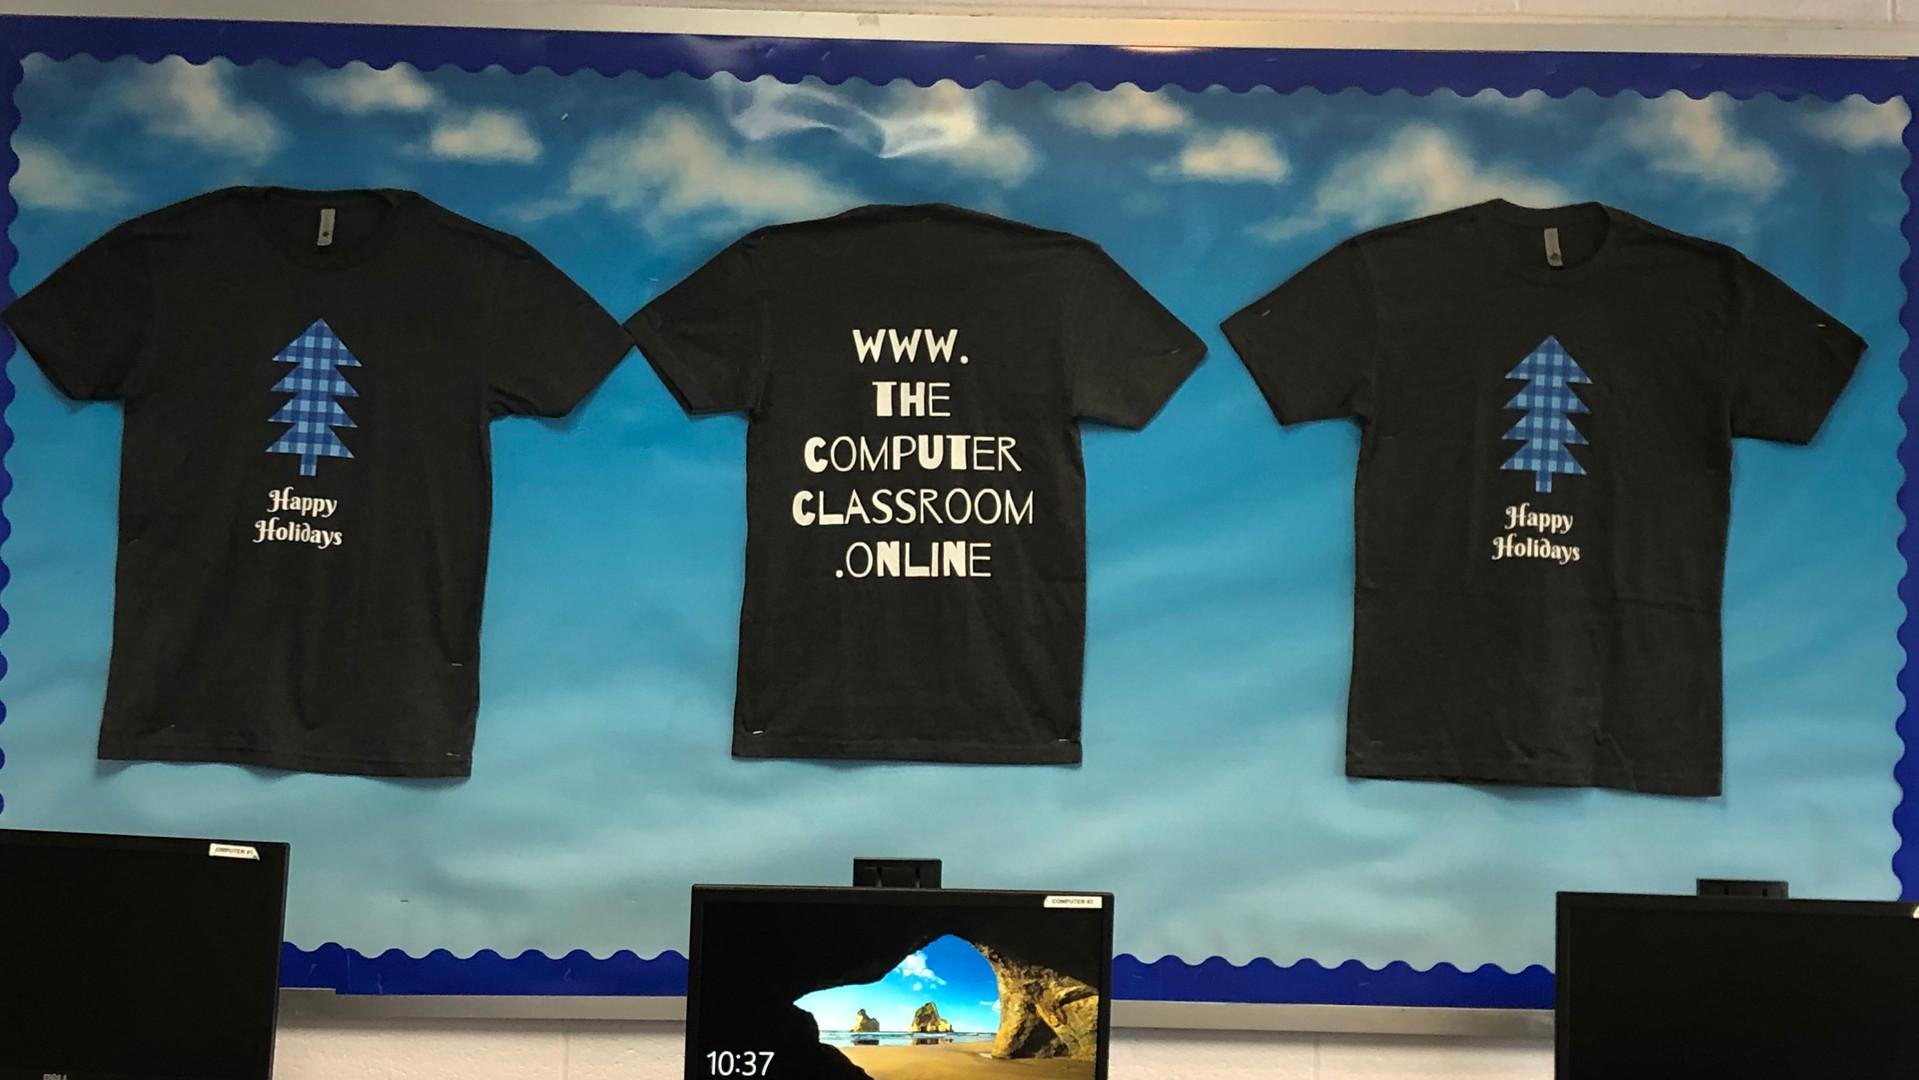 Classroom Custom Designed Holiday T-shirts